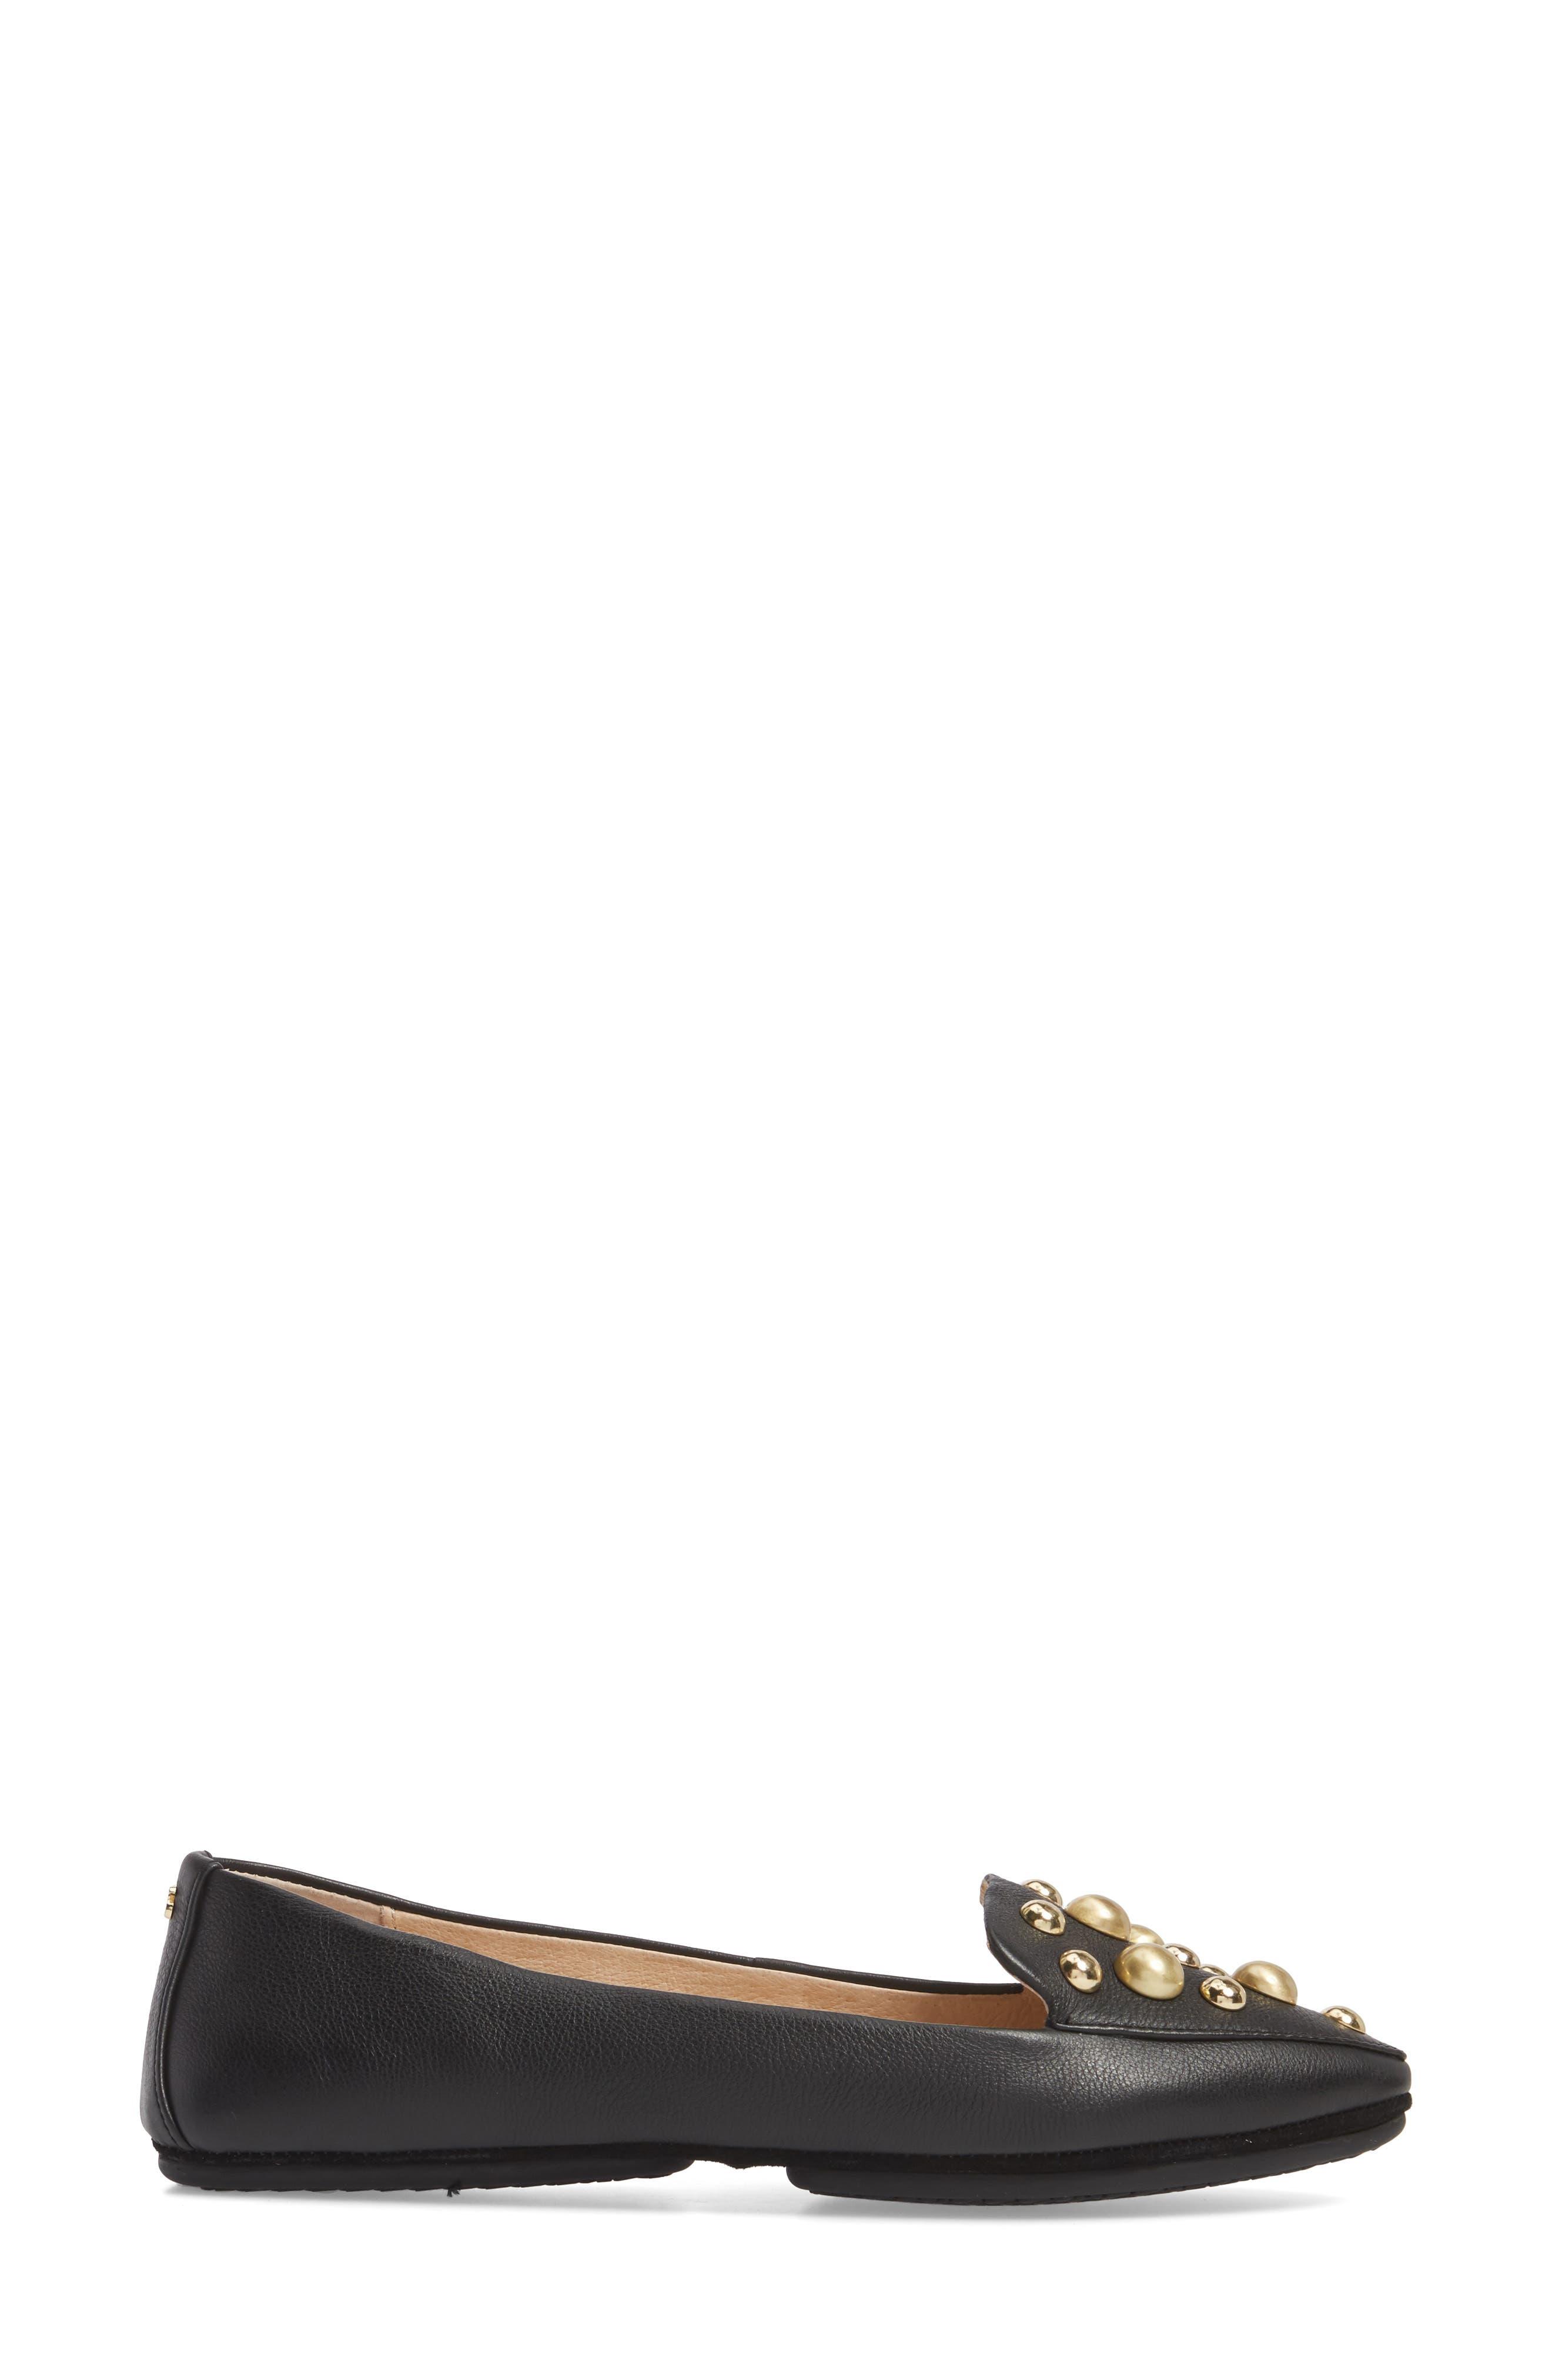 Vera Studded Loafer,                             Alternate thumbnail 3, color,                             002